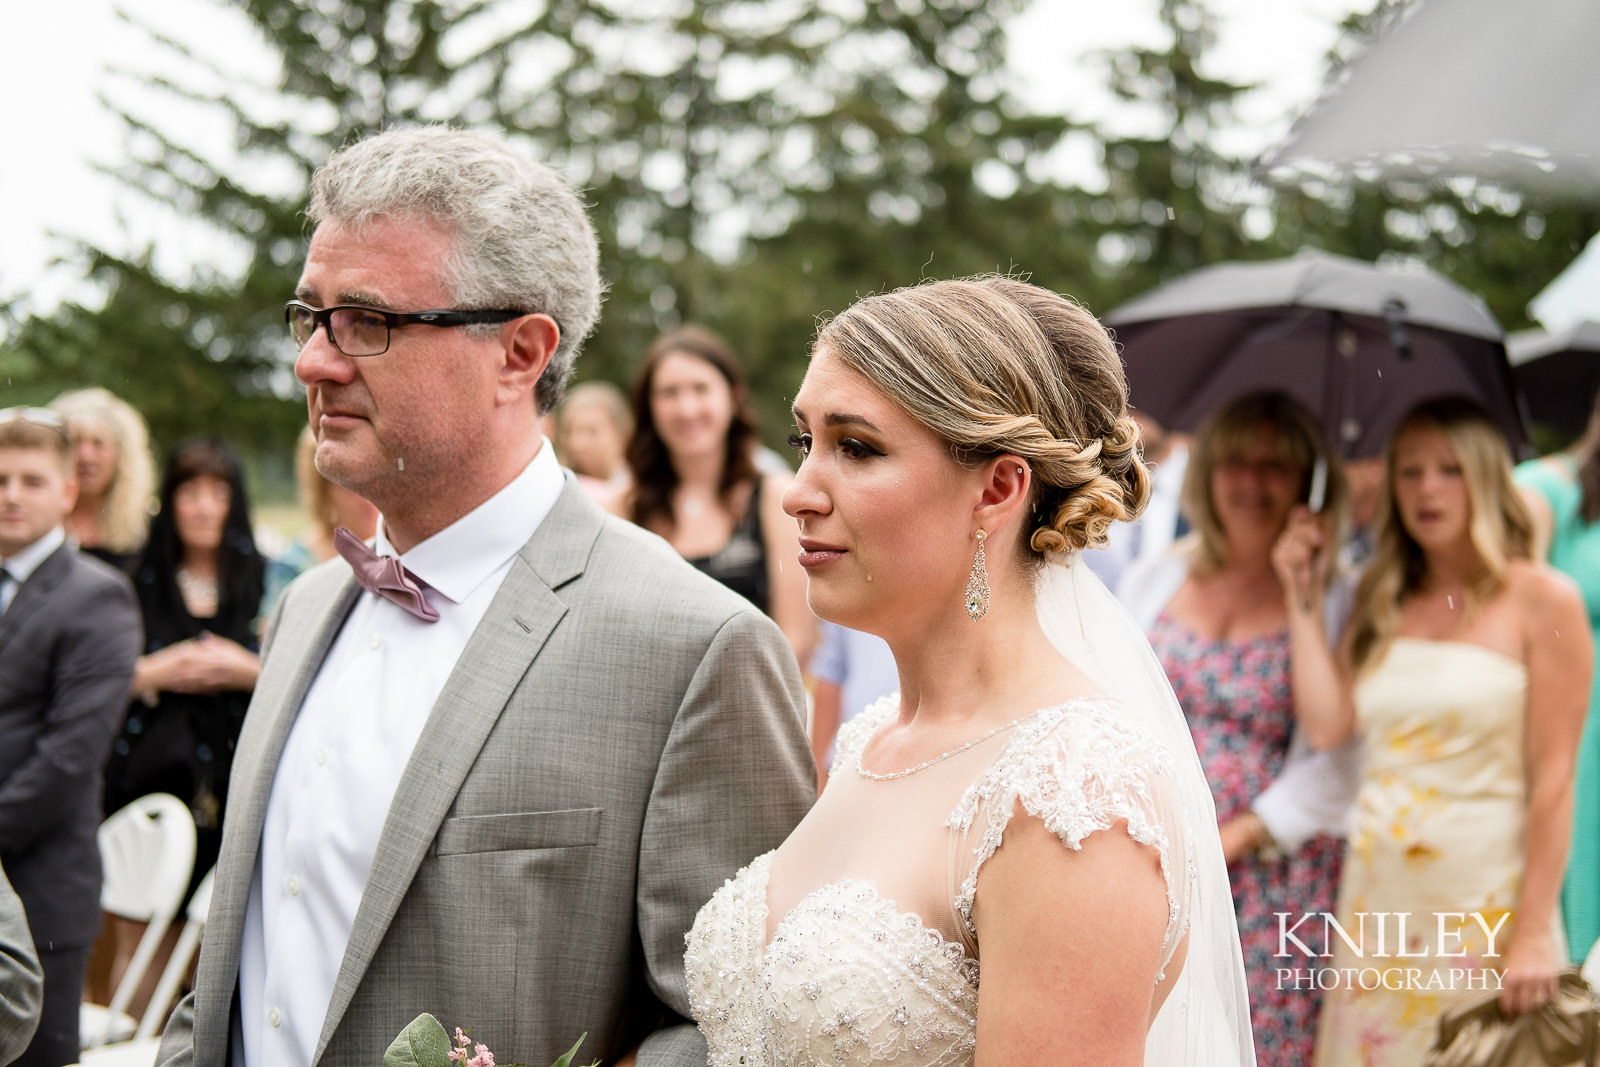 Ontario Golf Club wedding picture - Bride walking down the aisle,jpg